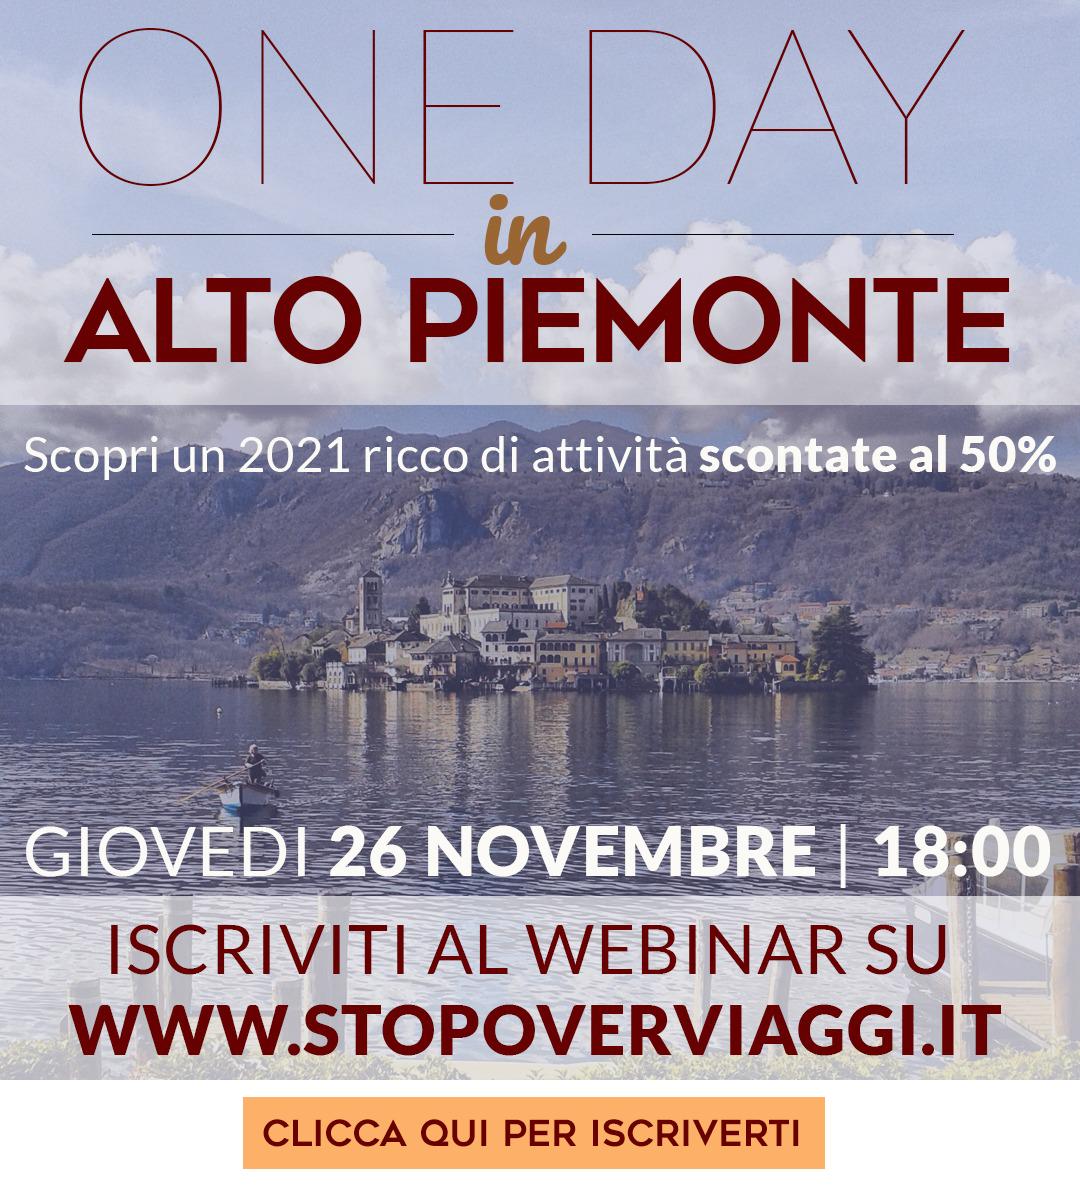 Webinar AltoPiemonte - Stopover Viaggi